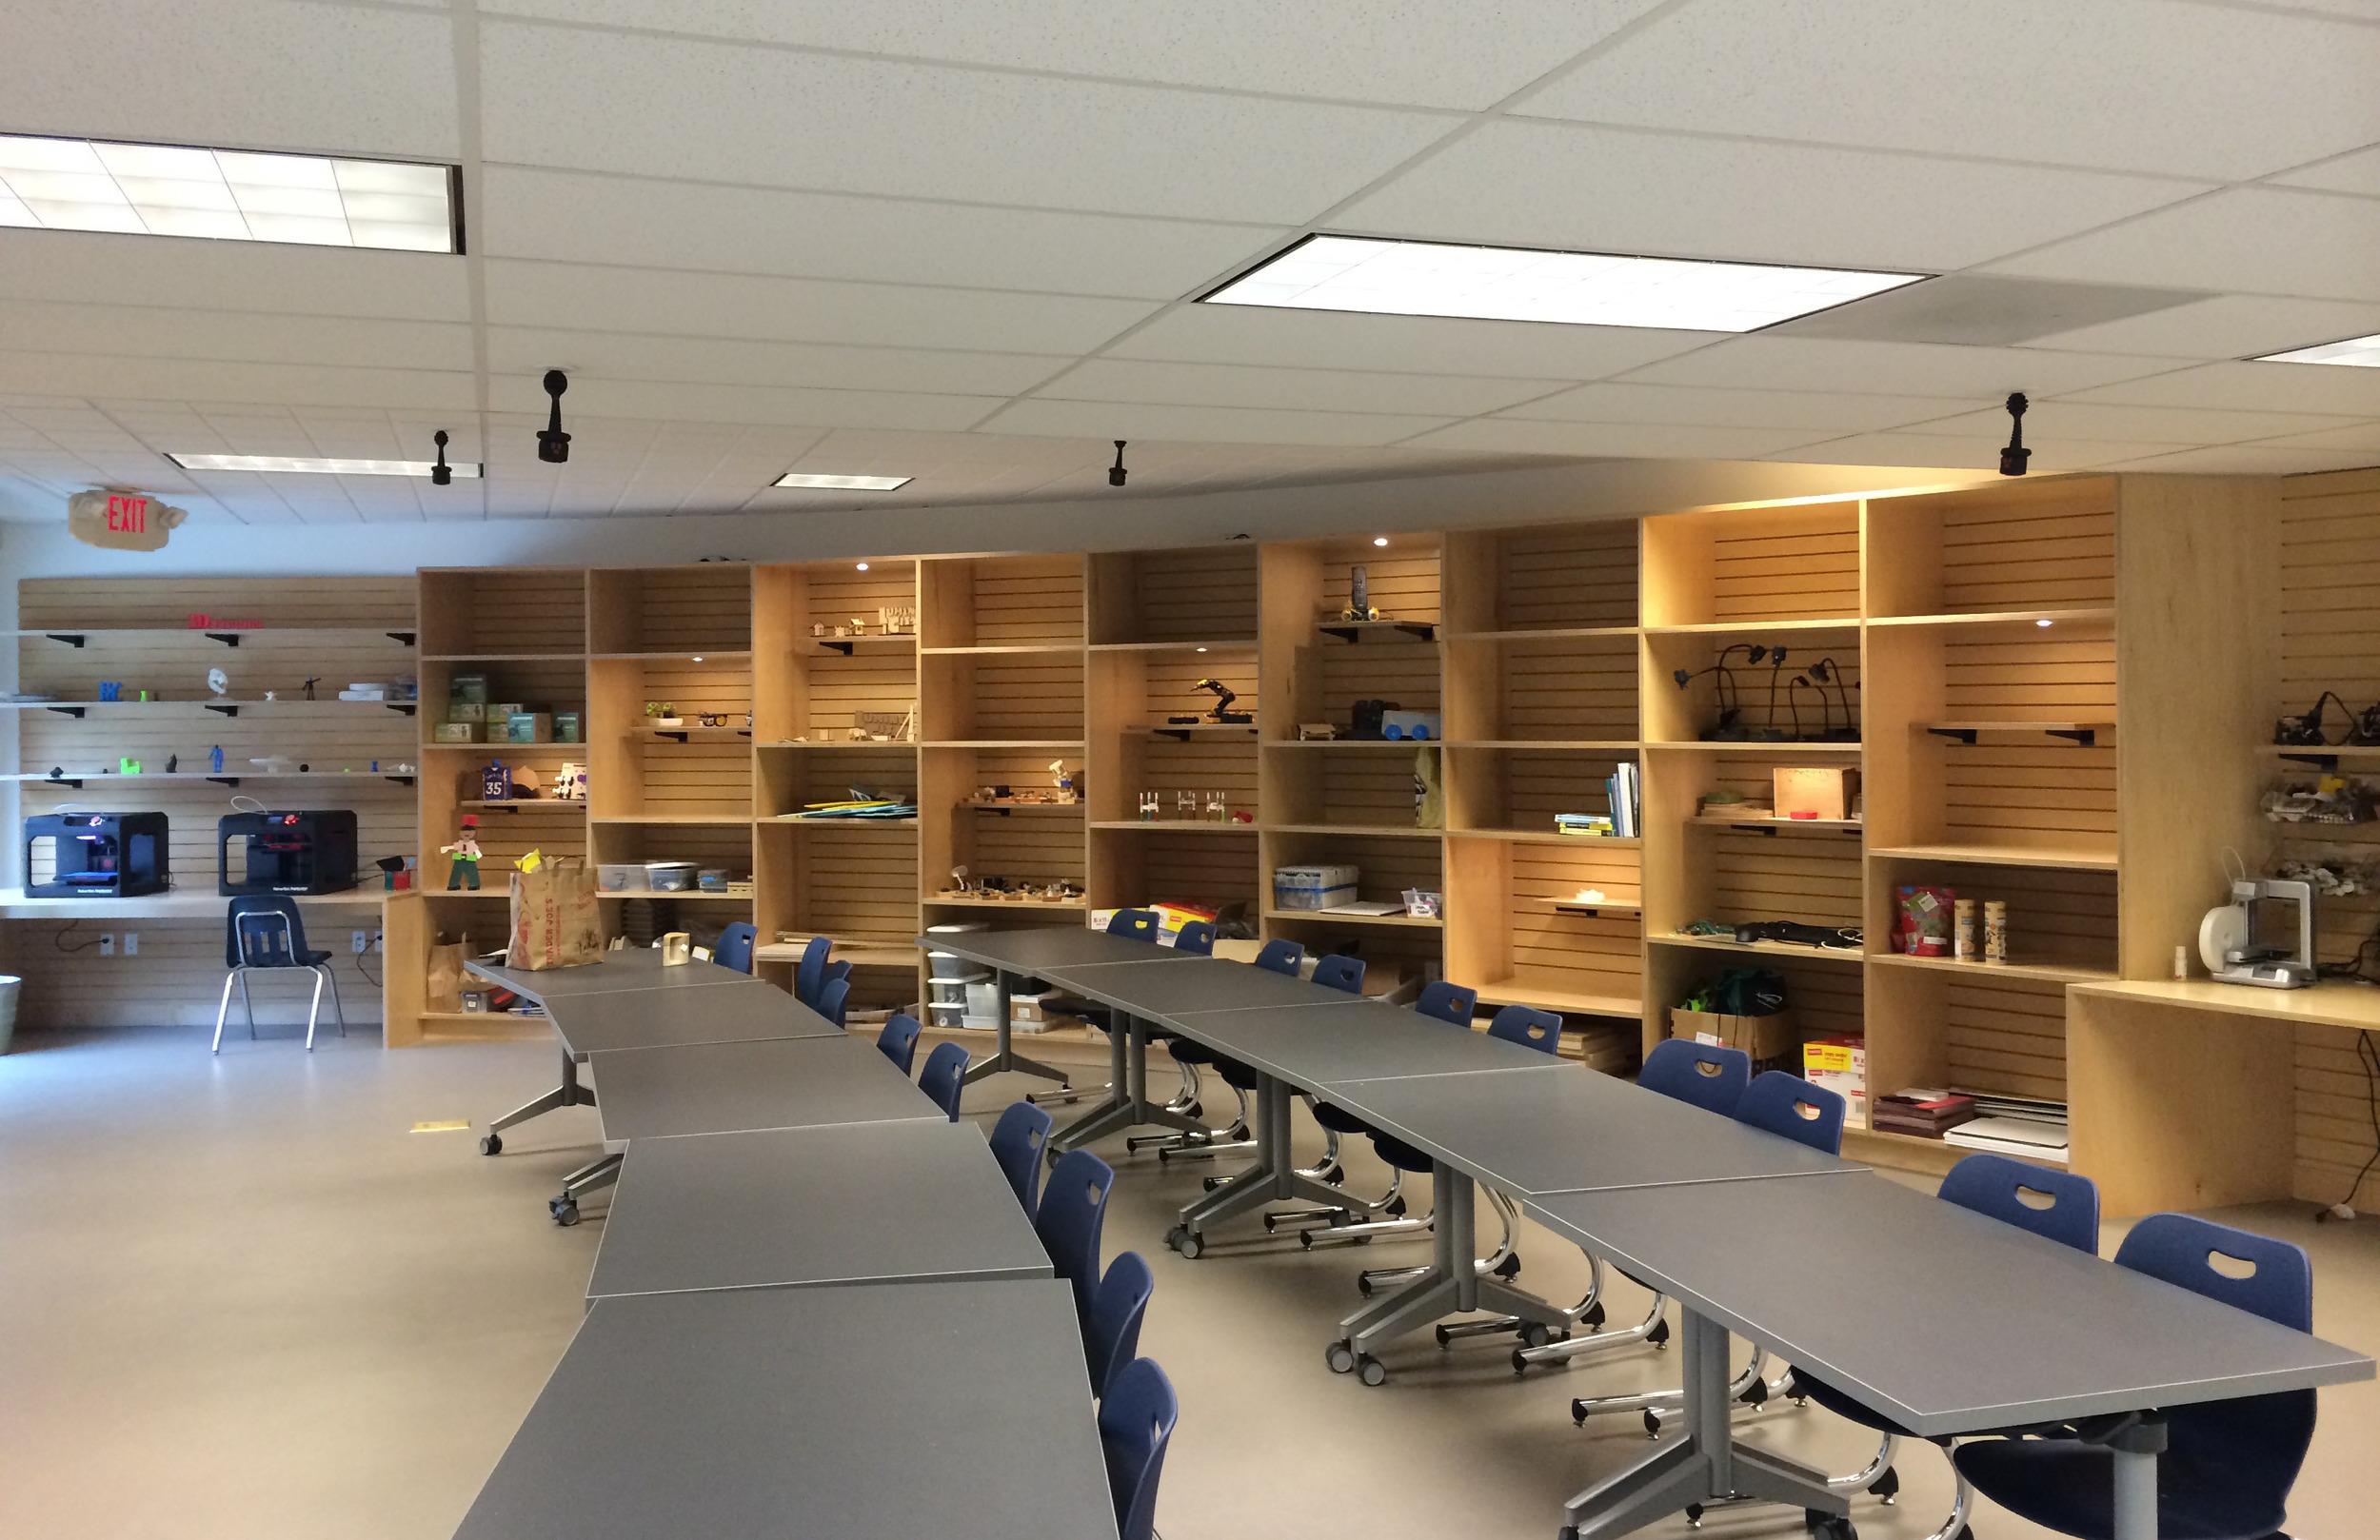 Interior Classroom Completion